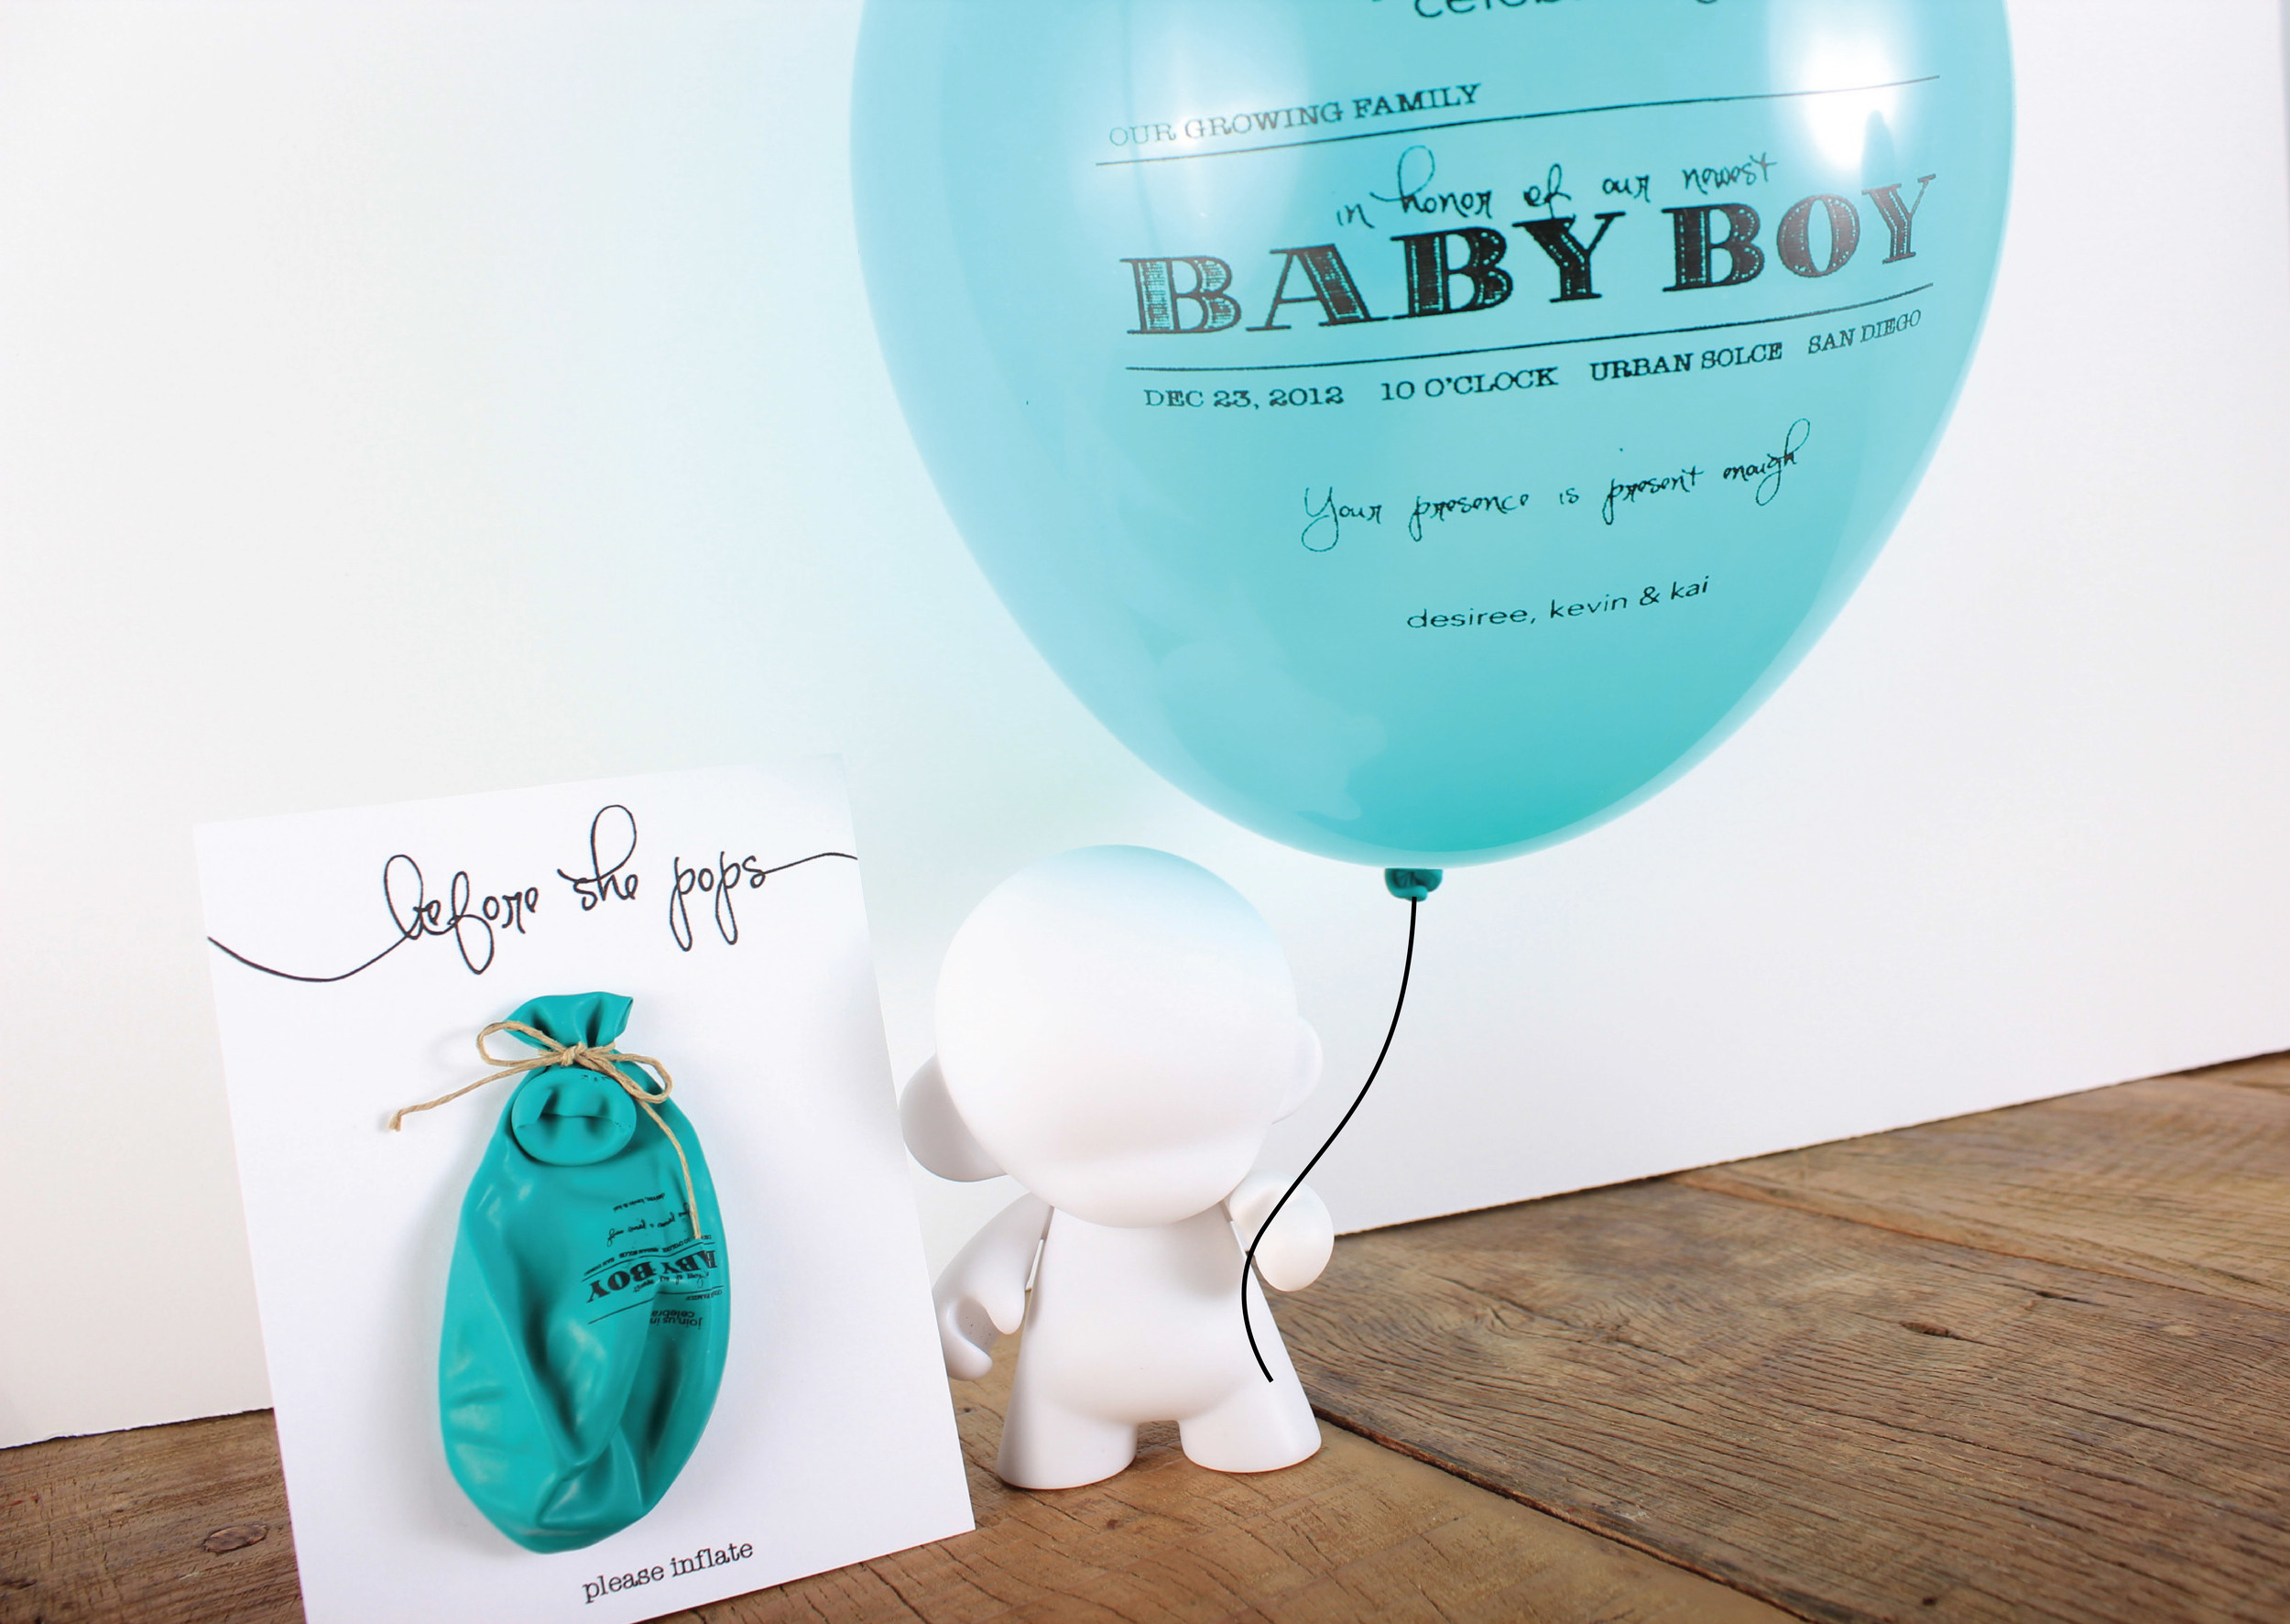 Robot holding Balloon Invite-01.jpg